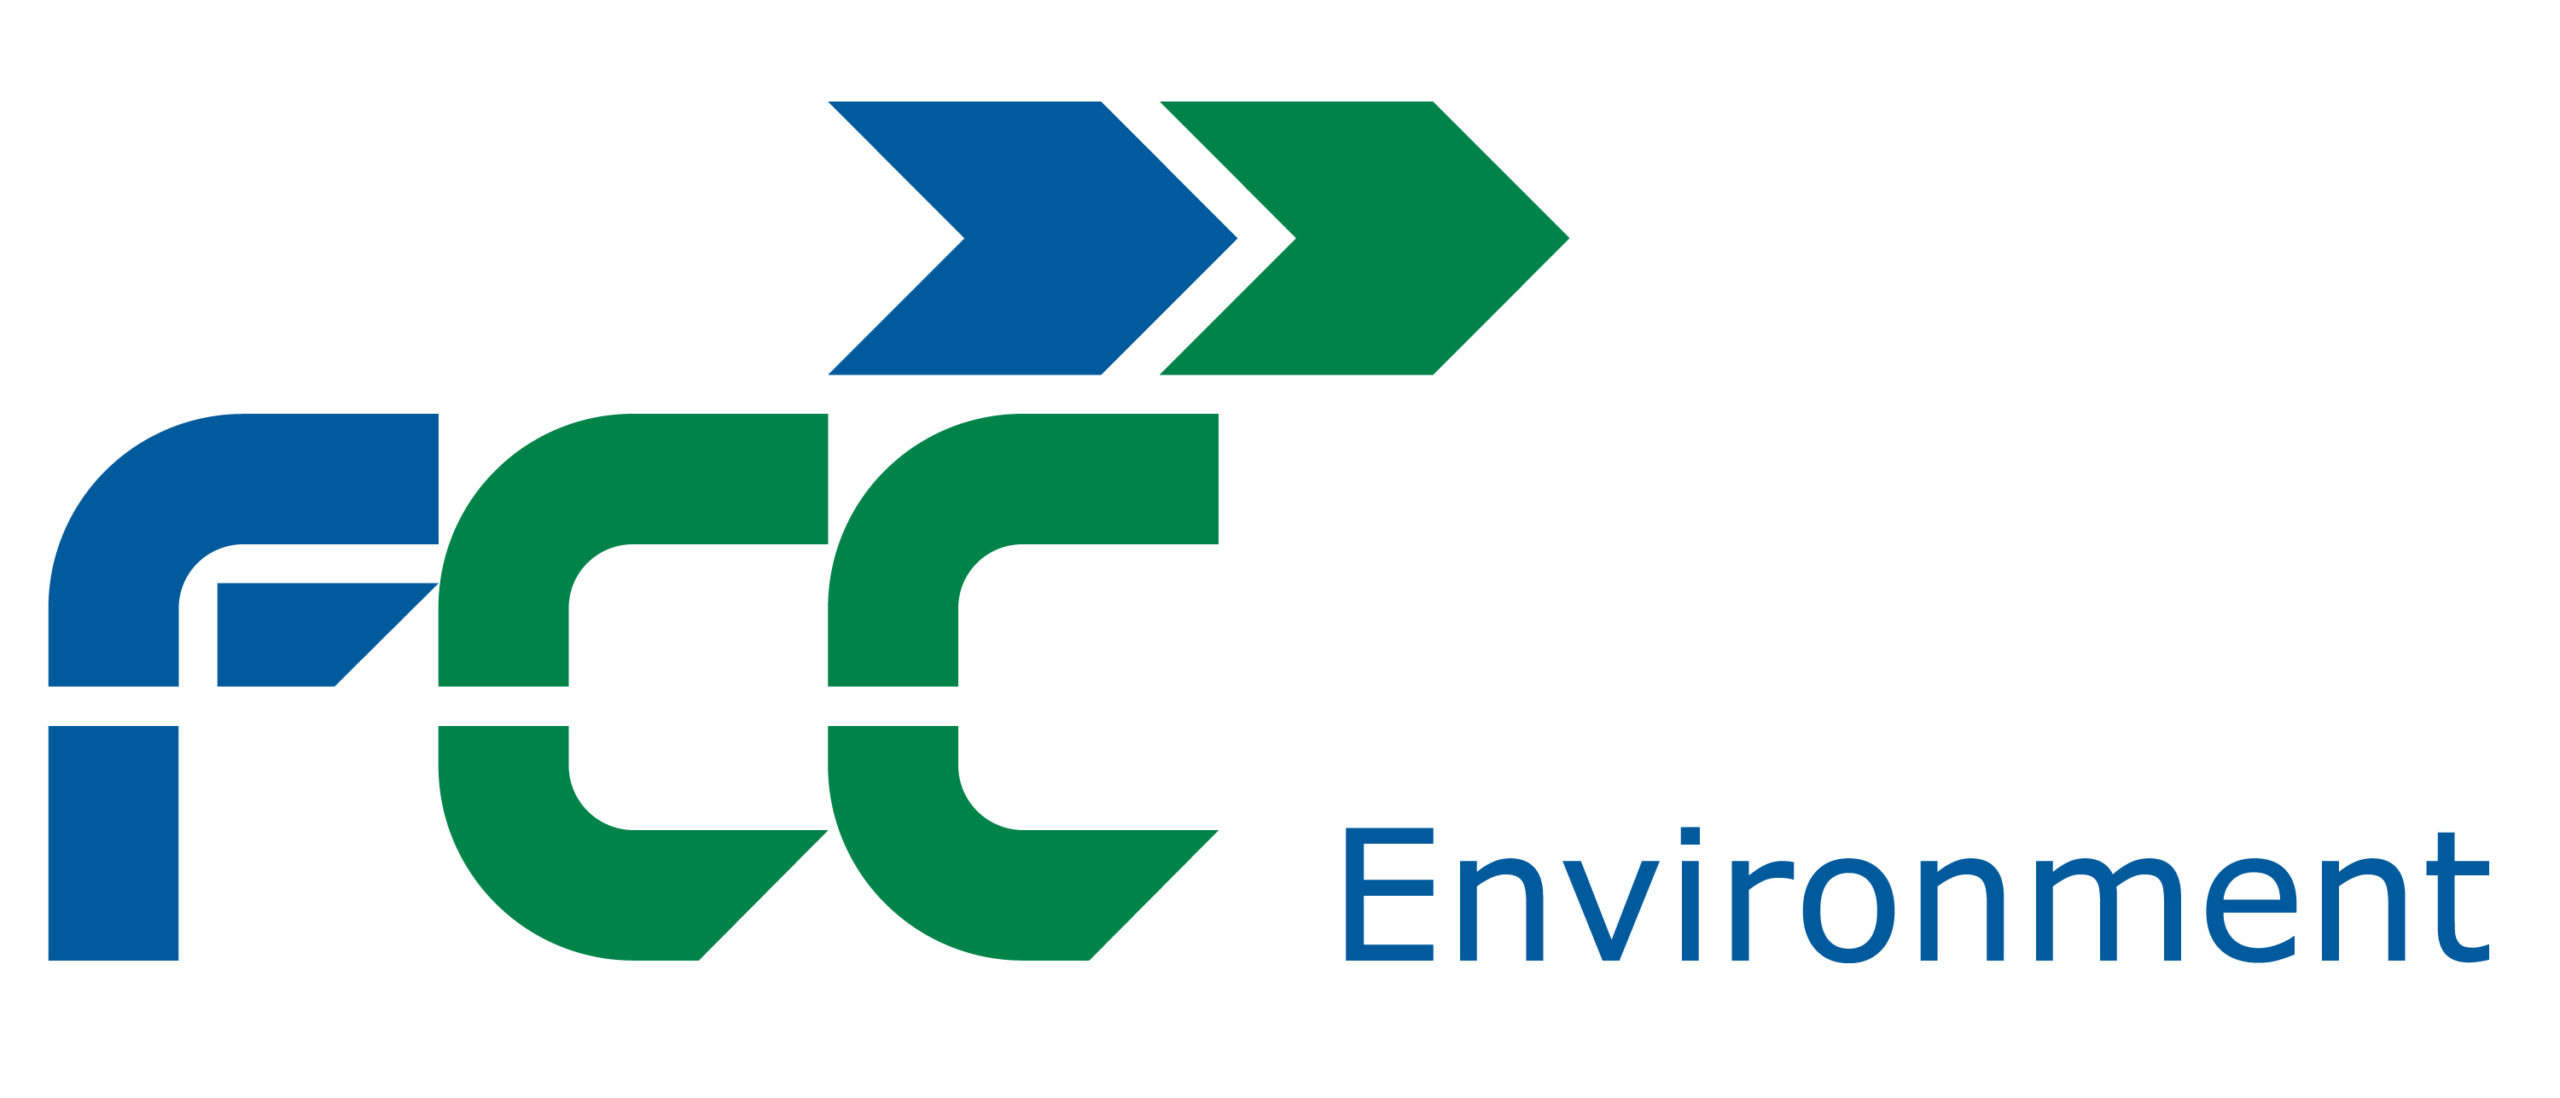 FCC - logo pozdlzne